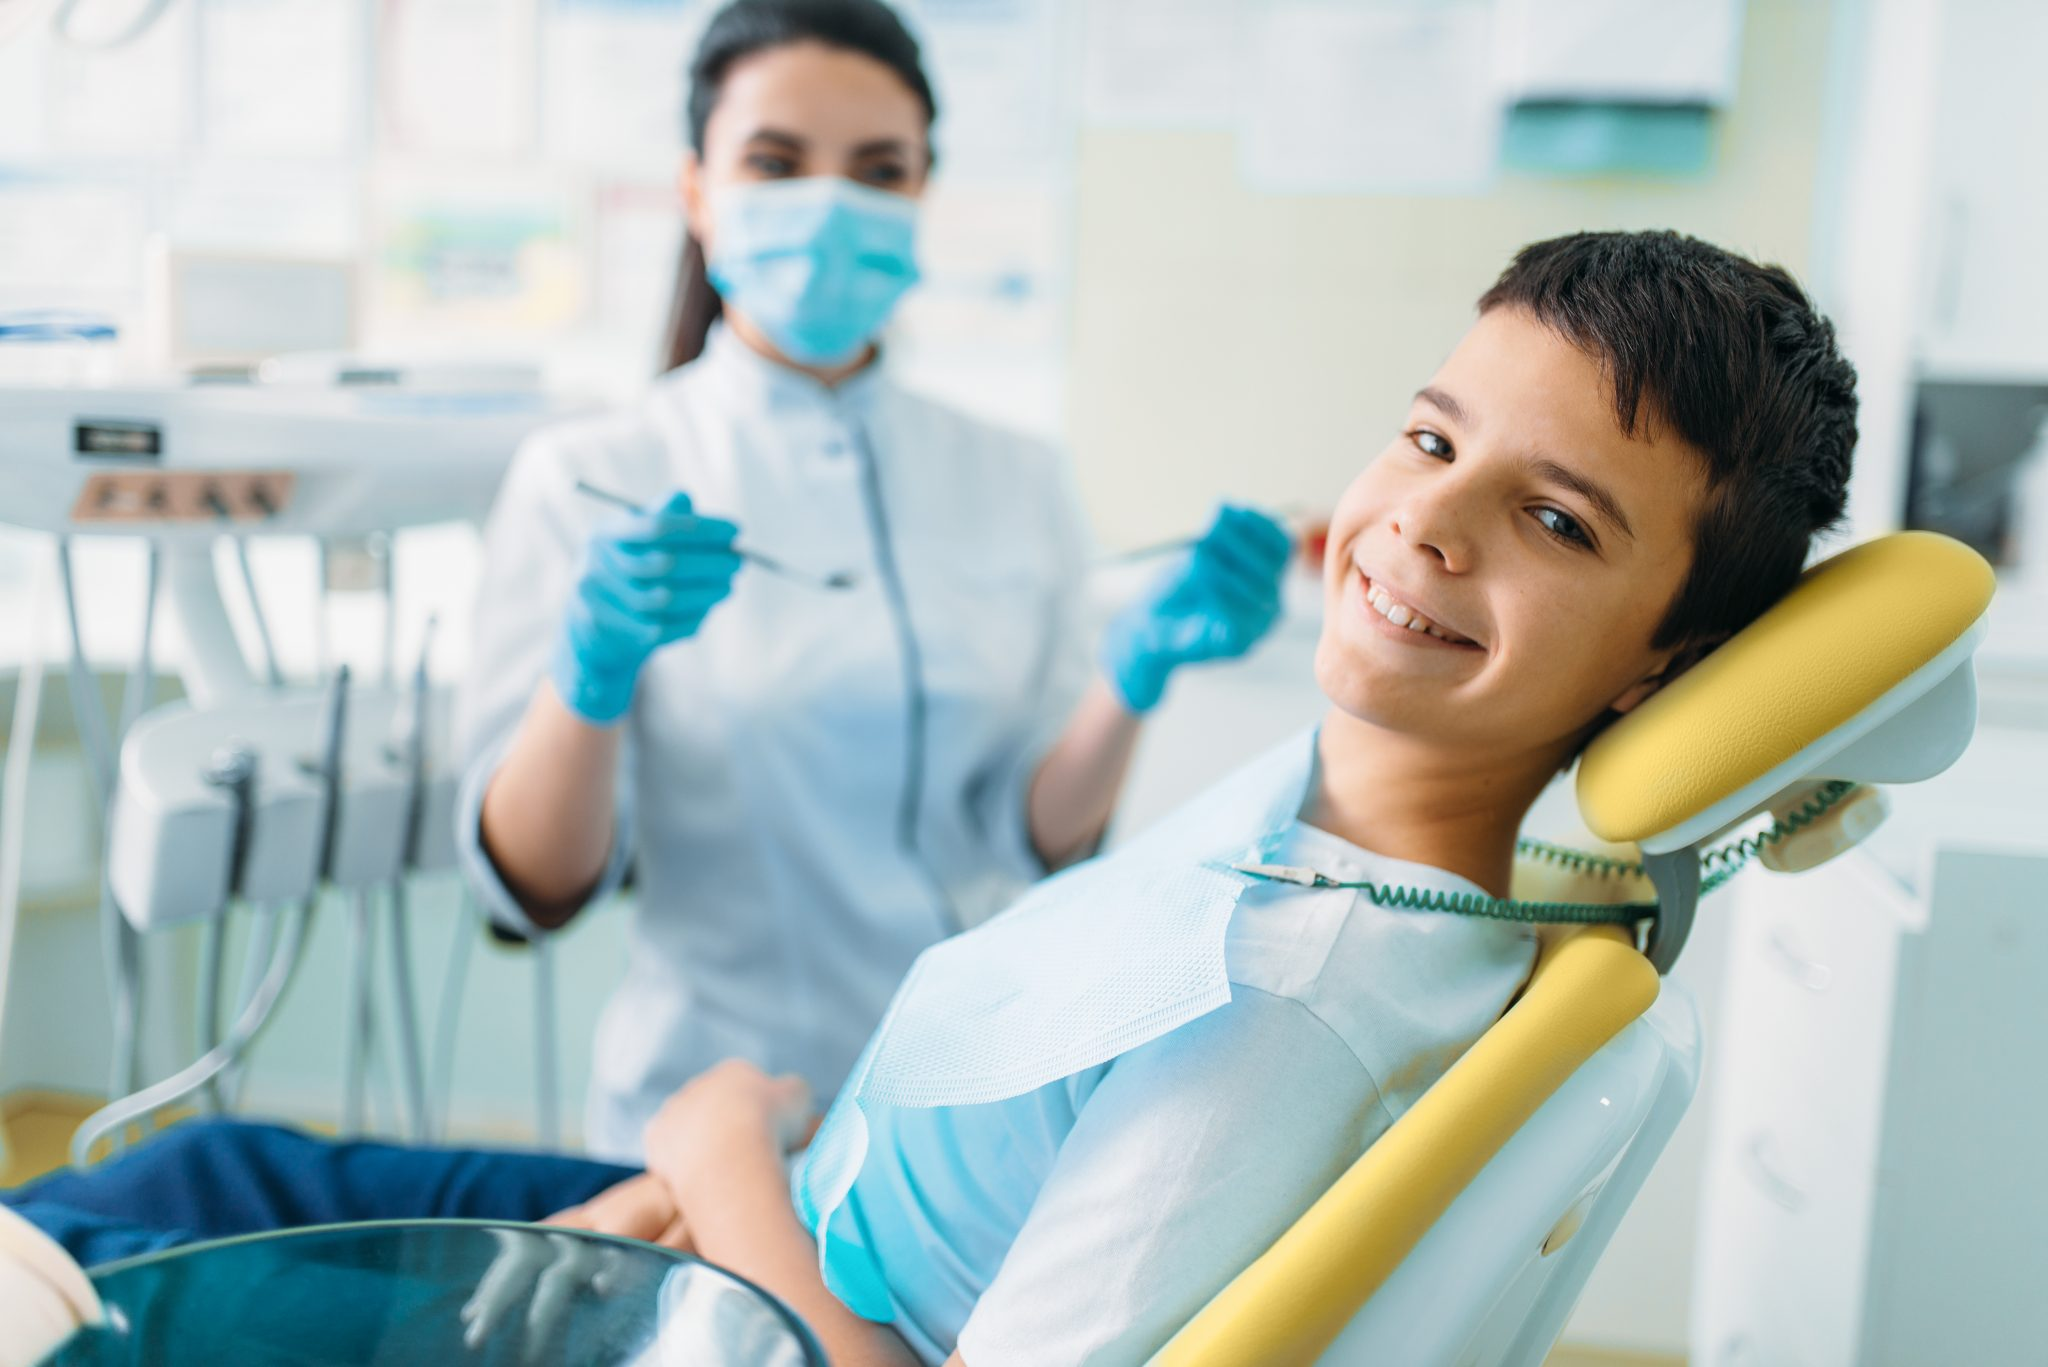 Smiling little boy in a dental chair, professional pediatric dentistry, children stomatology, female dentist on background